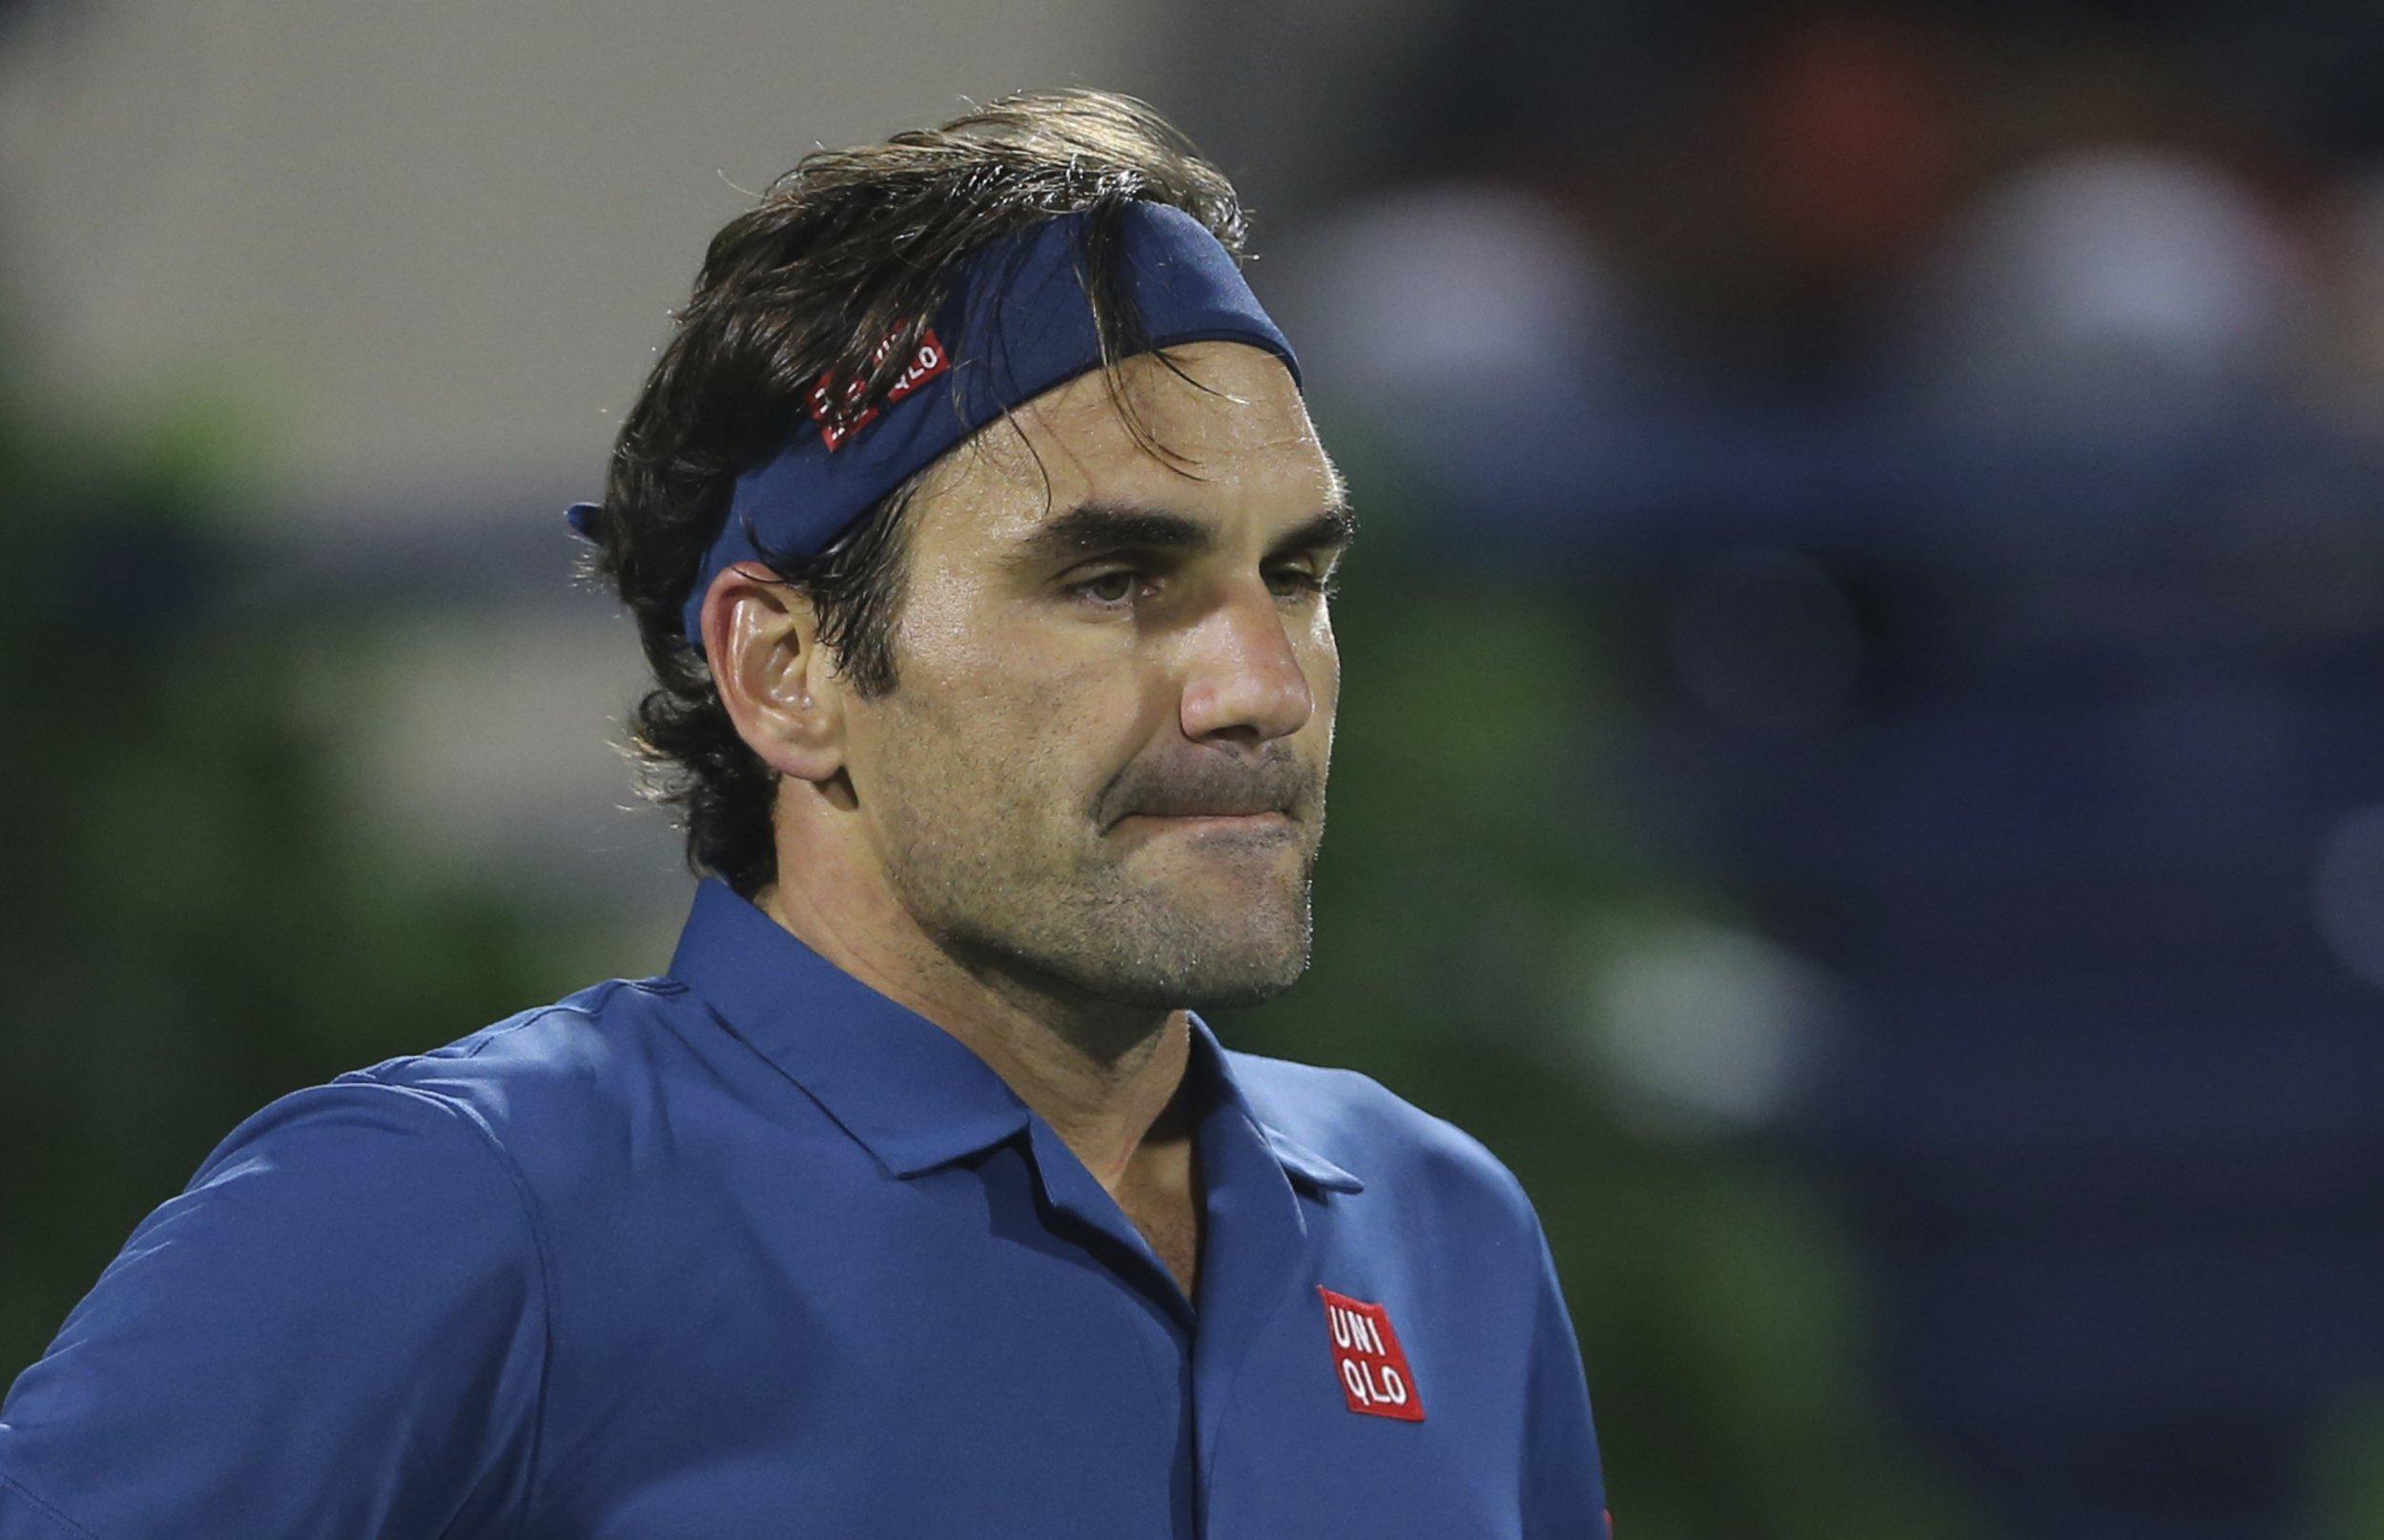 Roger Federer of Switzerland reacts during a match against Philipp Kohlschreiber of Germany at the Dubai Duty Free Tennis Championship, in Dubai, United Arab Emirates, Monday, Feb. 25, 2019. (AP Photo/Kamran Jebreili)